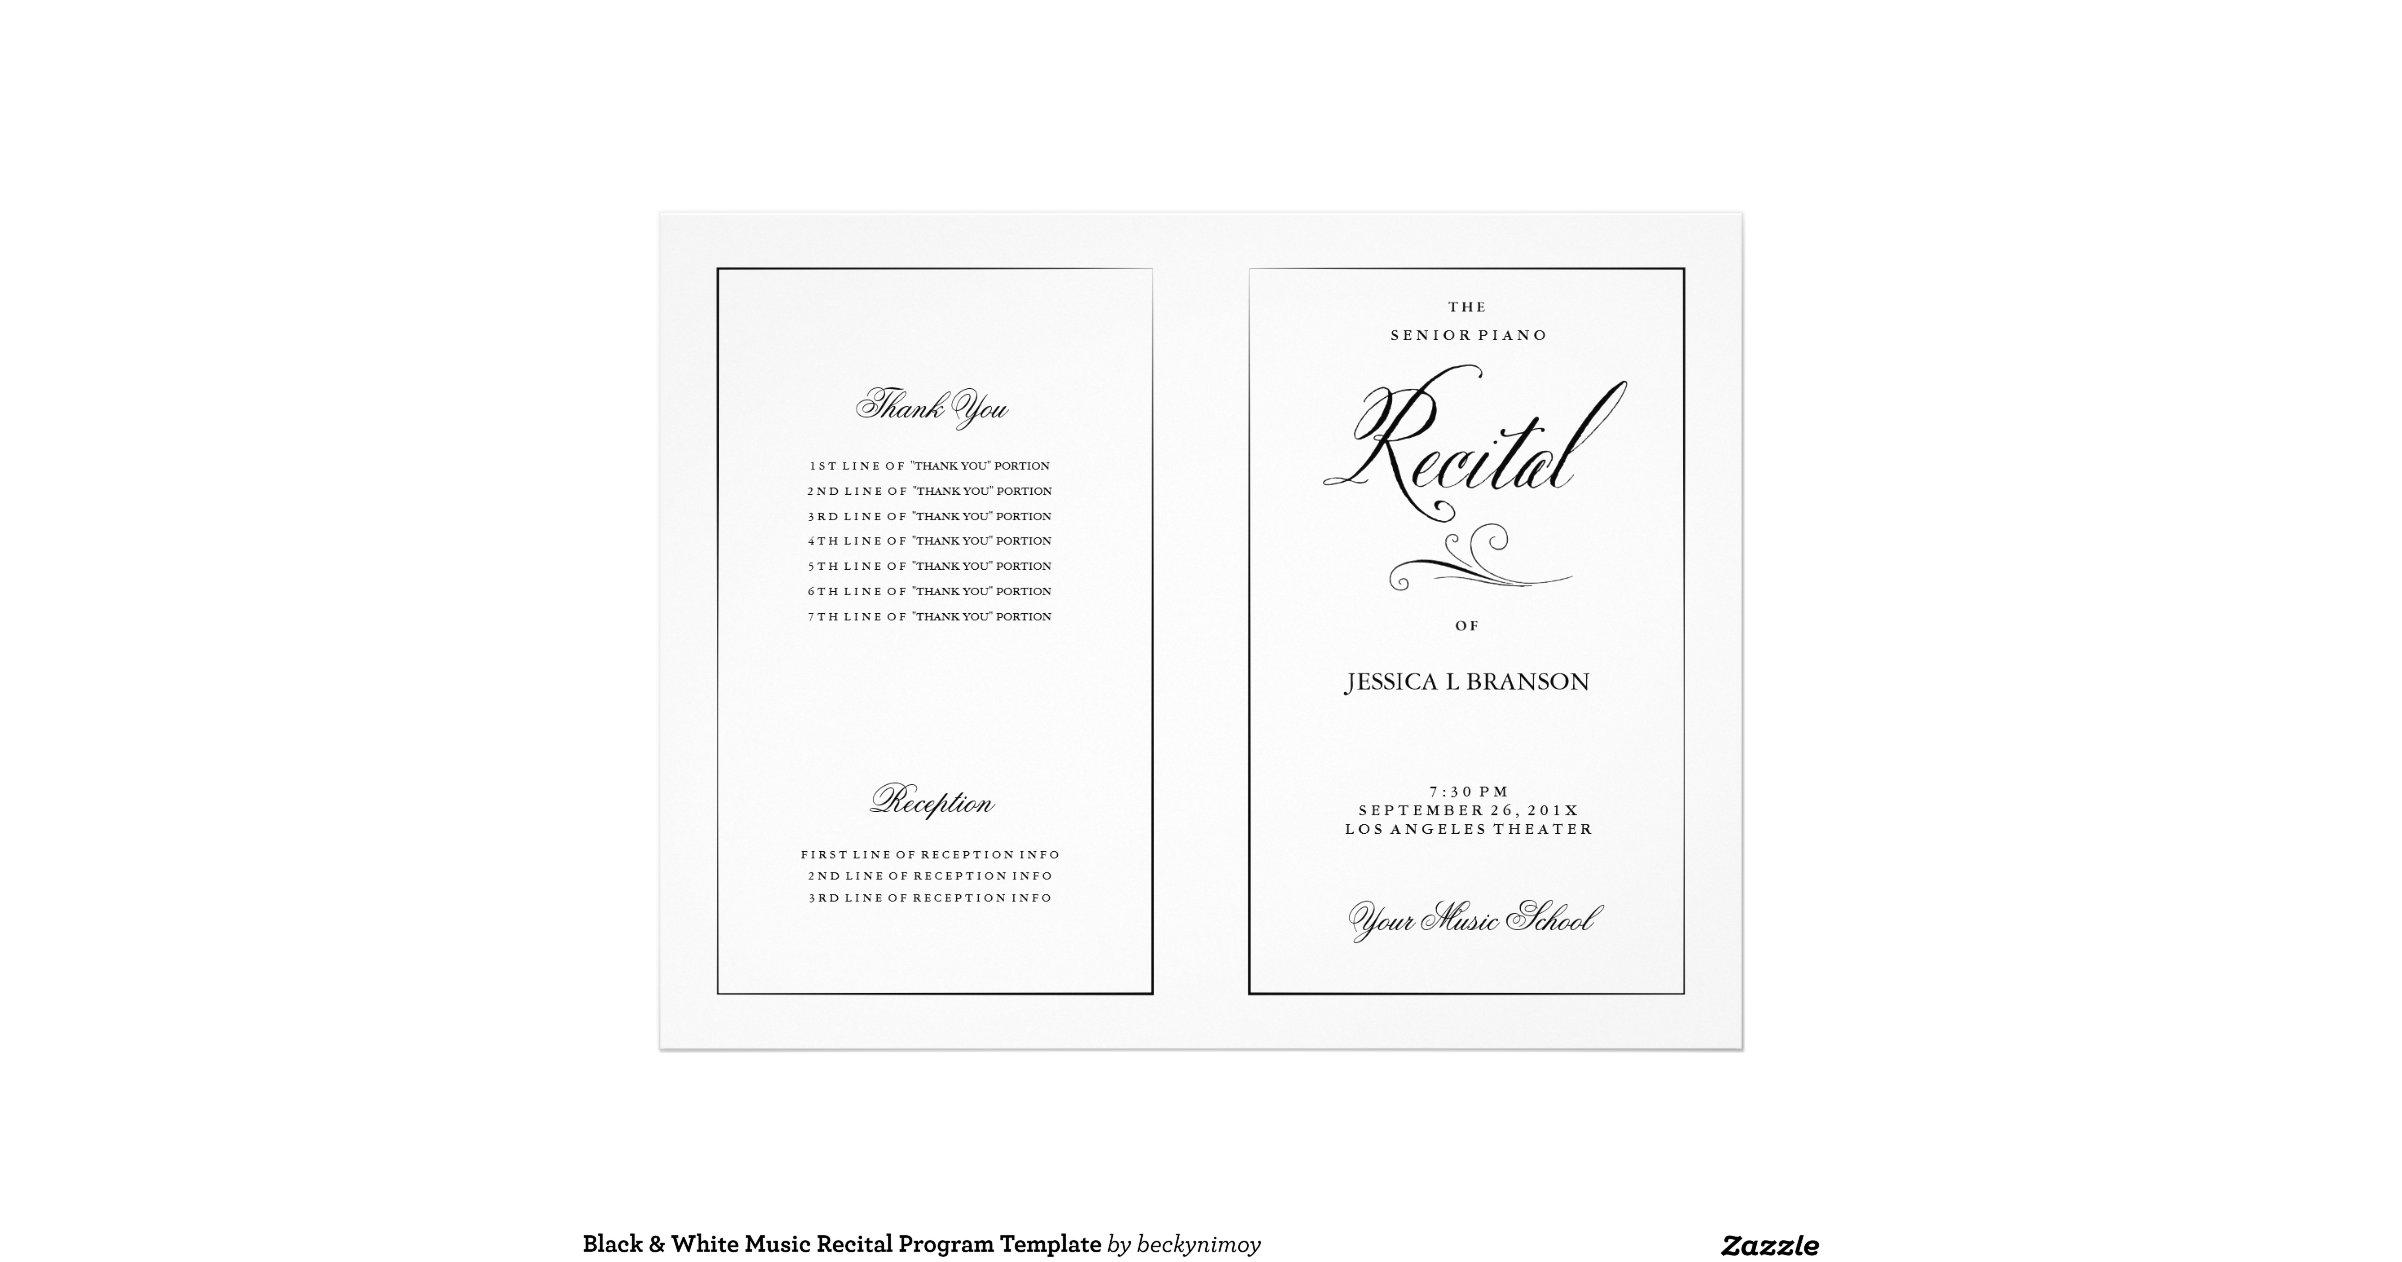 Snap Black White Music Recital Program Template Flyer Zazzle Photos